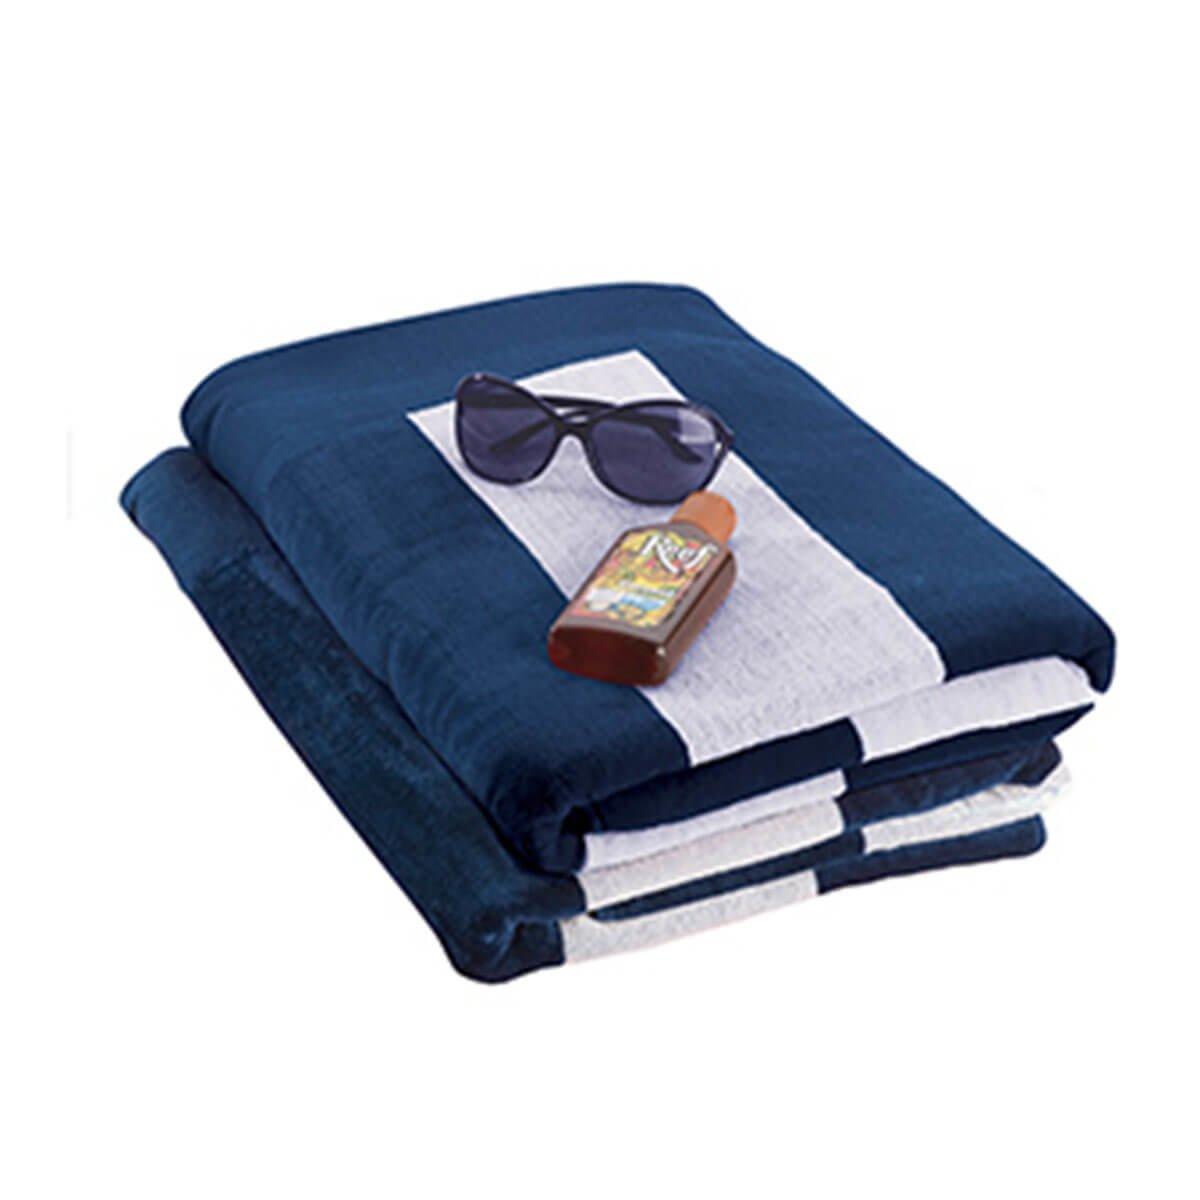 Beach Towel-Blue with White Stripes.